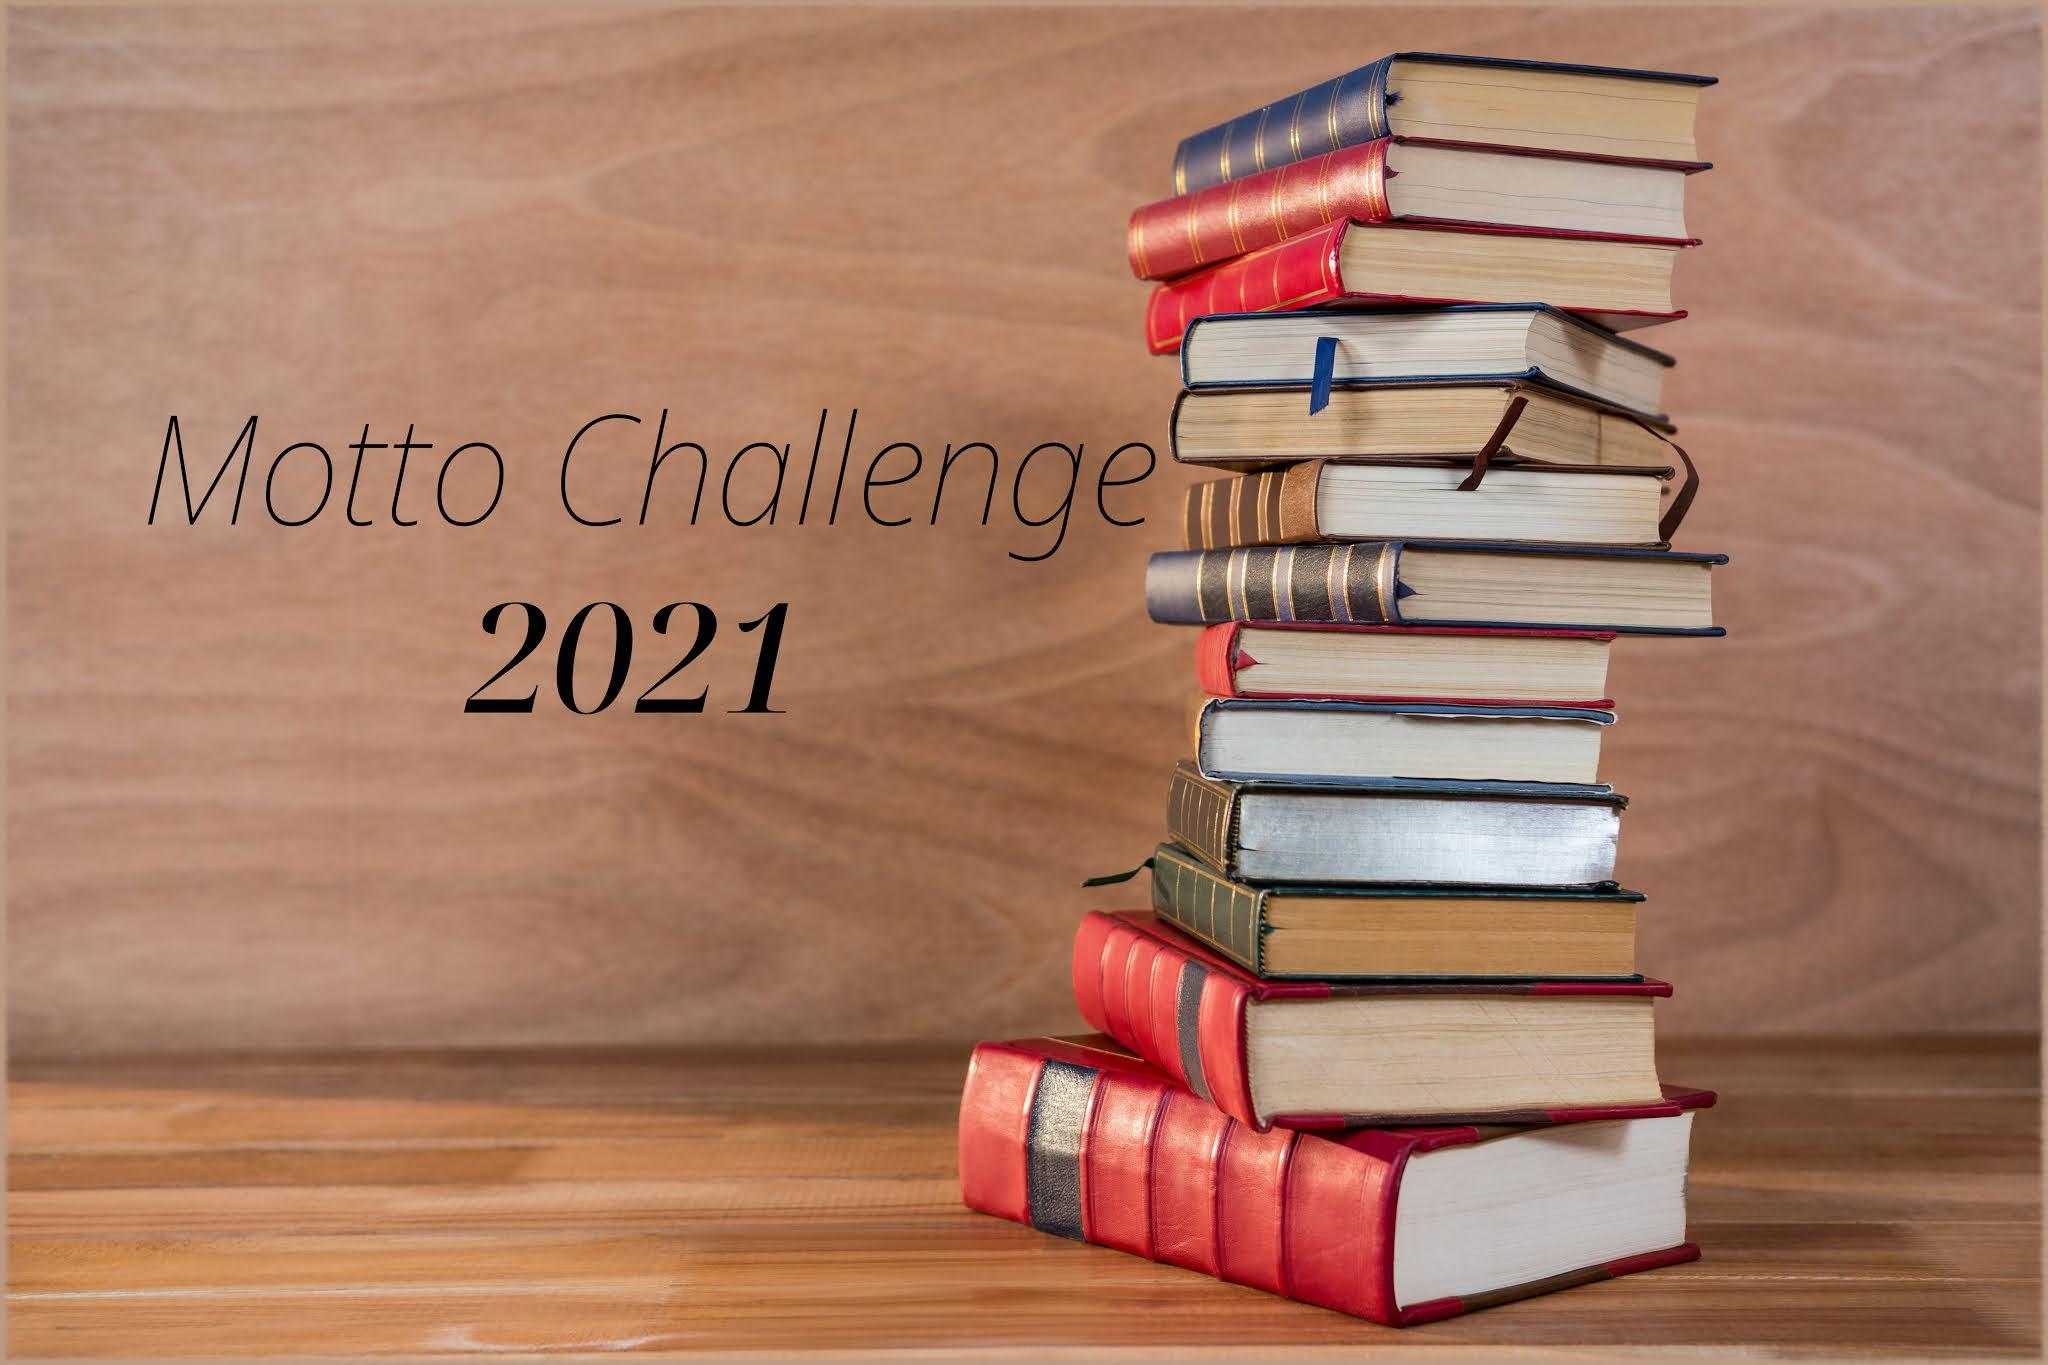 Challenge Image 1